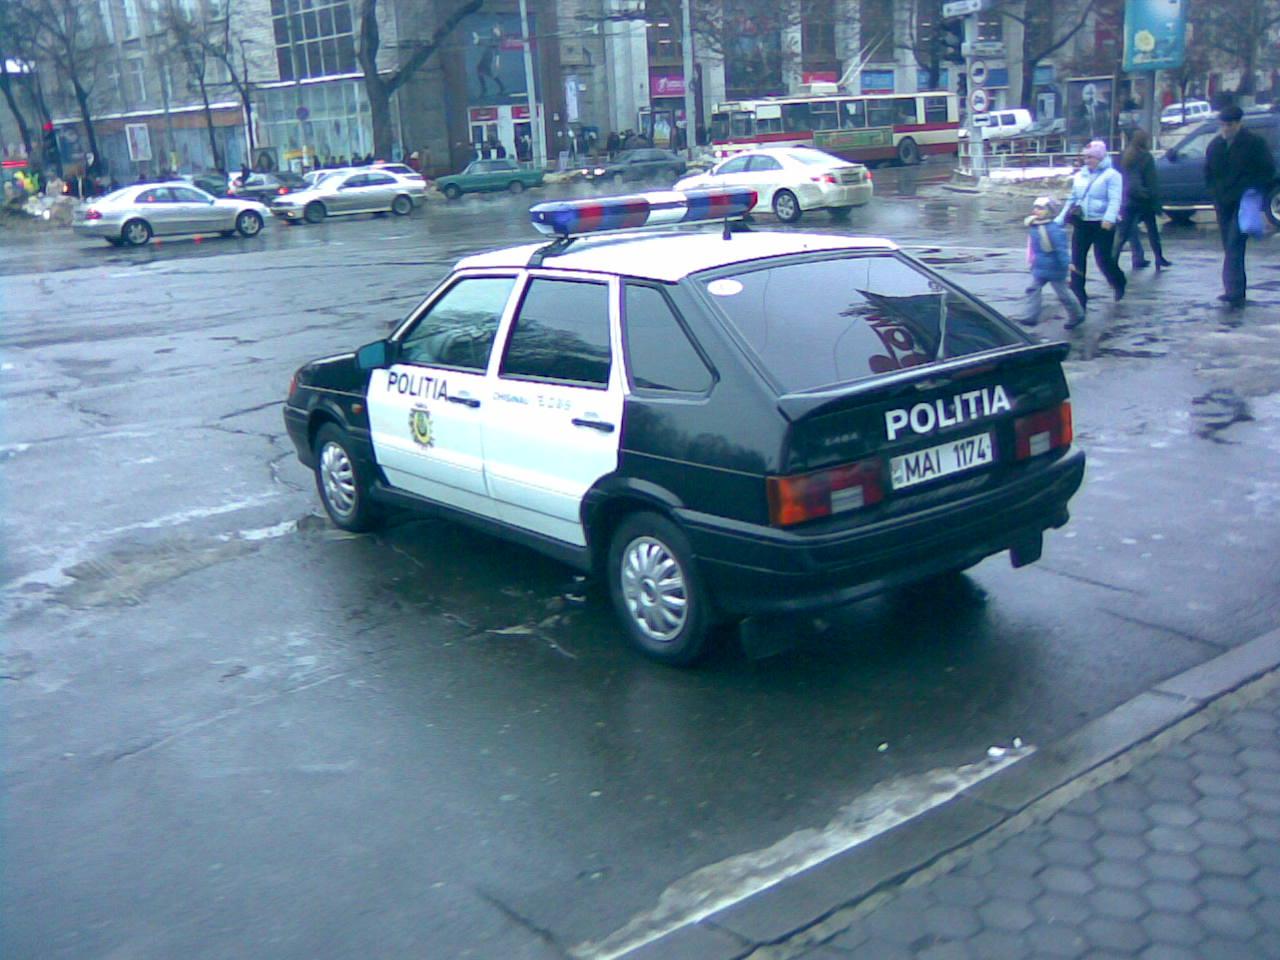 File:Lada 2114 politia 02.jpg